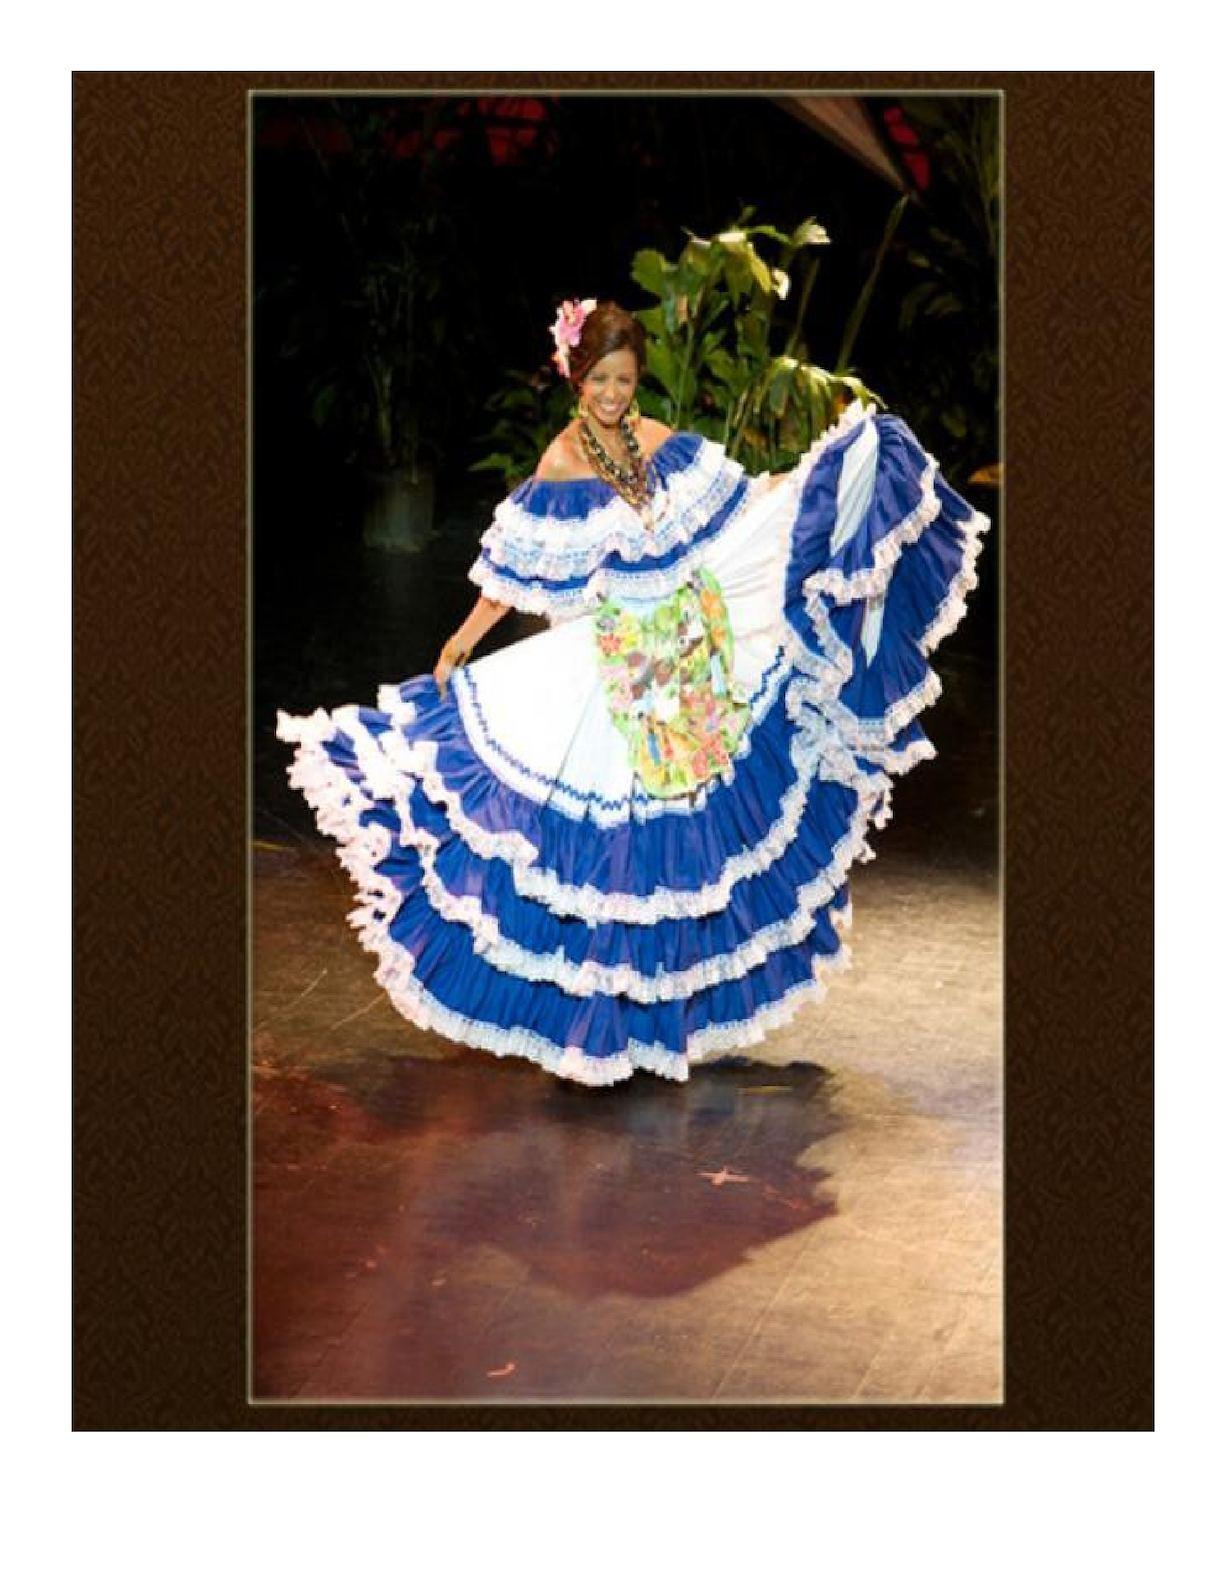 Boutique en ligne 97d17 0db17 Calaméo - Faldas Tipicas Del Caribe